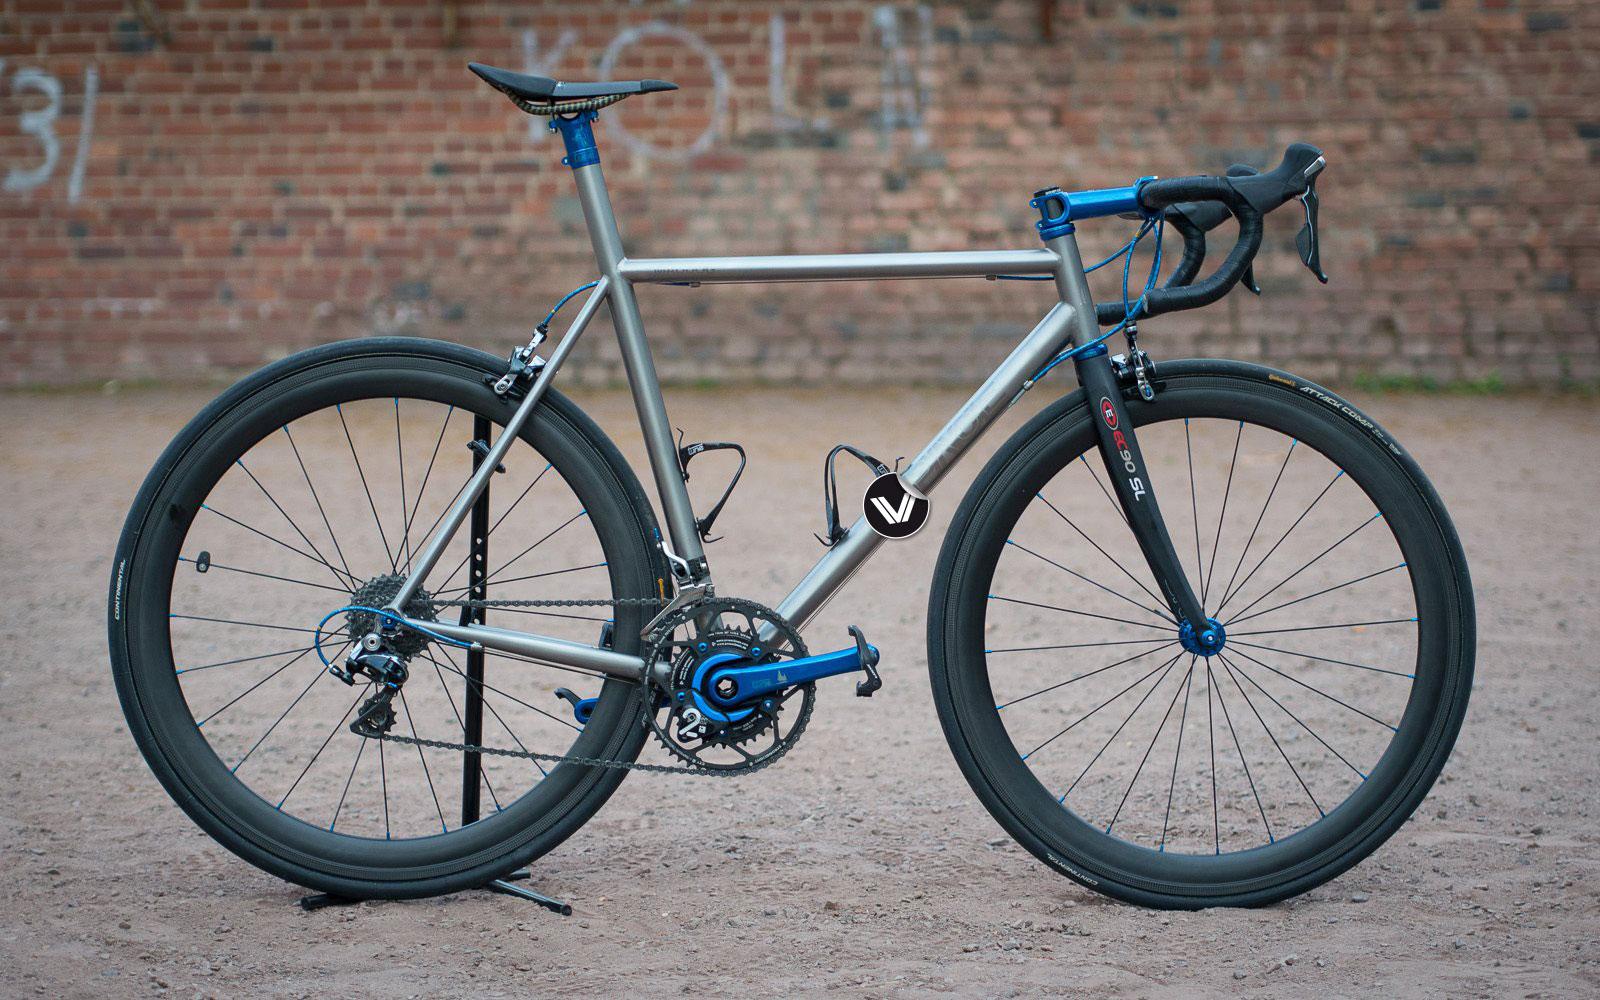 t1r titan rennrad rahmen vpace bikes 29er. Black Bedroom Furniture Sets. Home Design Ideas